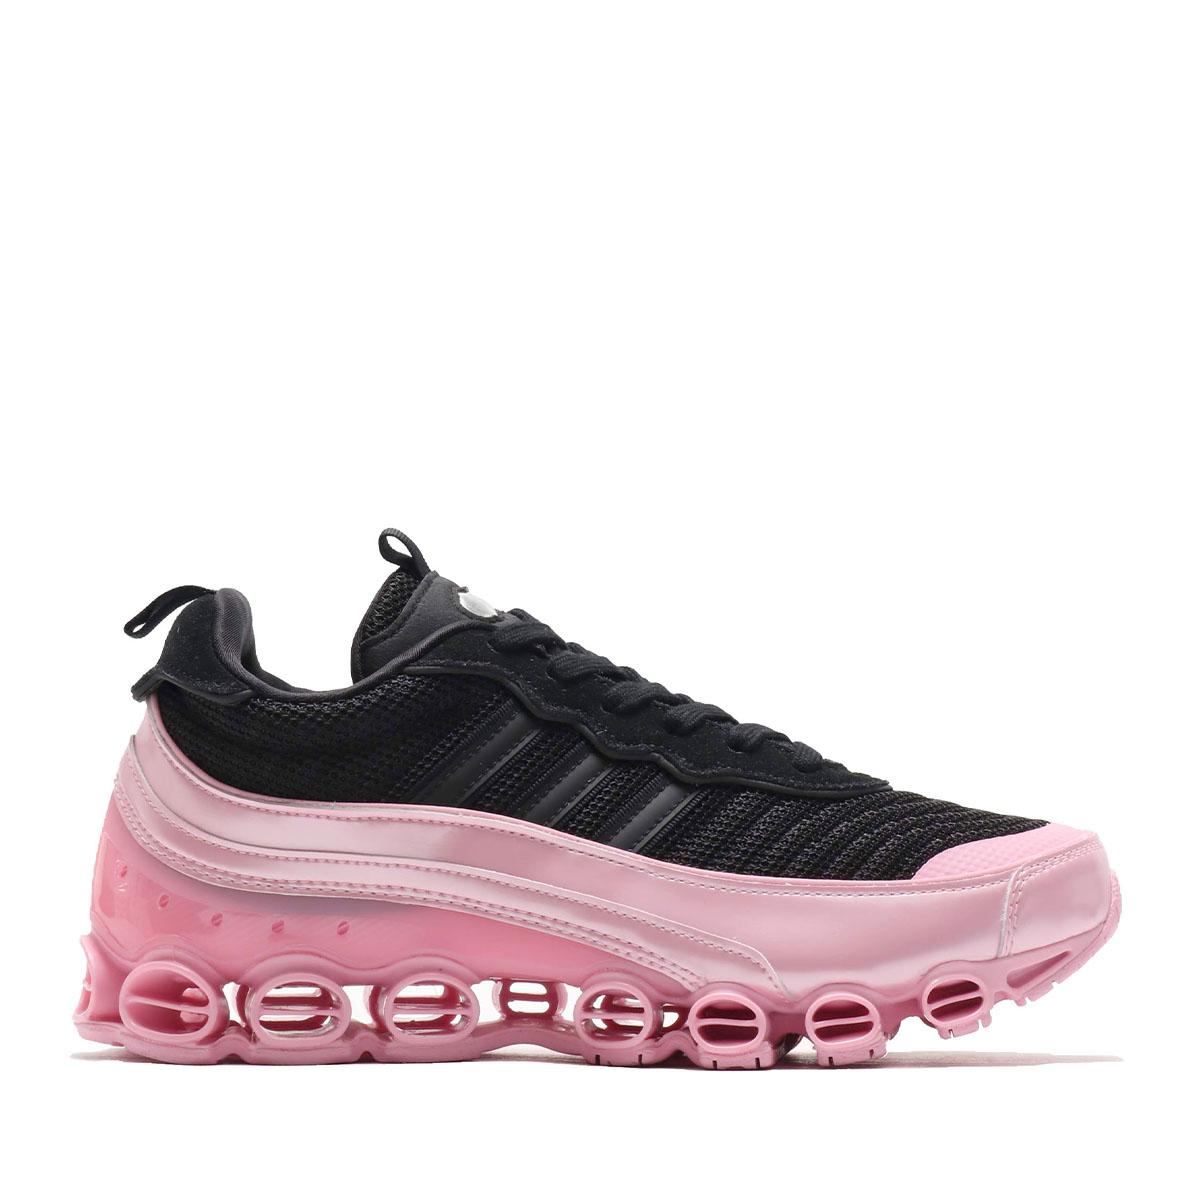 adidas MICROBOUNCE T1(CORE BLACK/CORE BLACK/TRUE PINK)(アディダスマイクロバウンス T1)【メンズ】【スニーカー】【20SS-S】